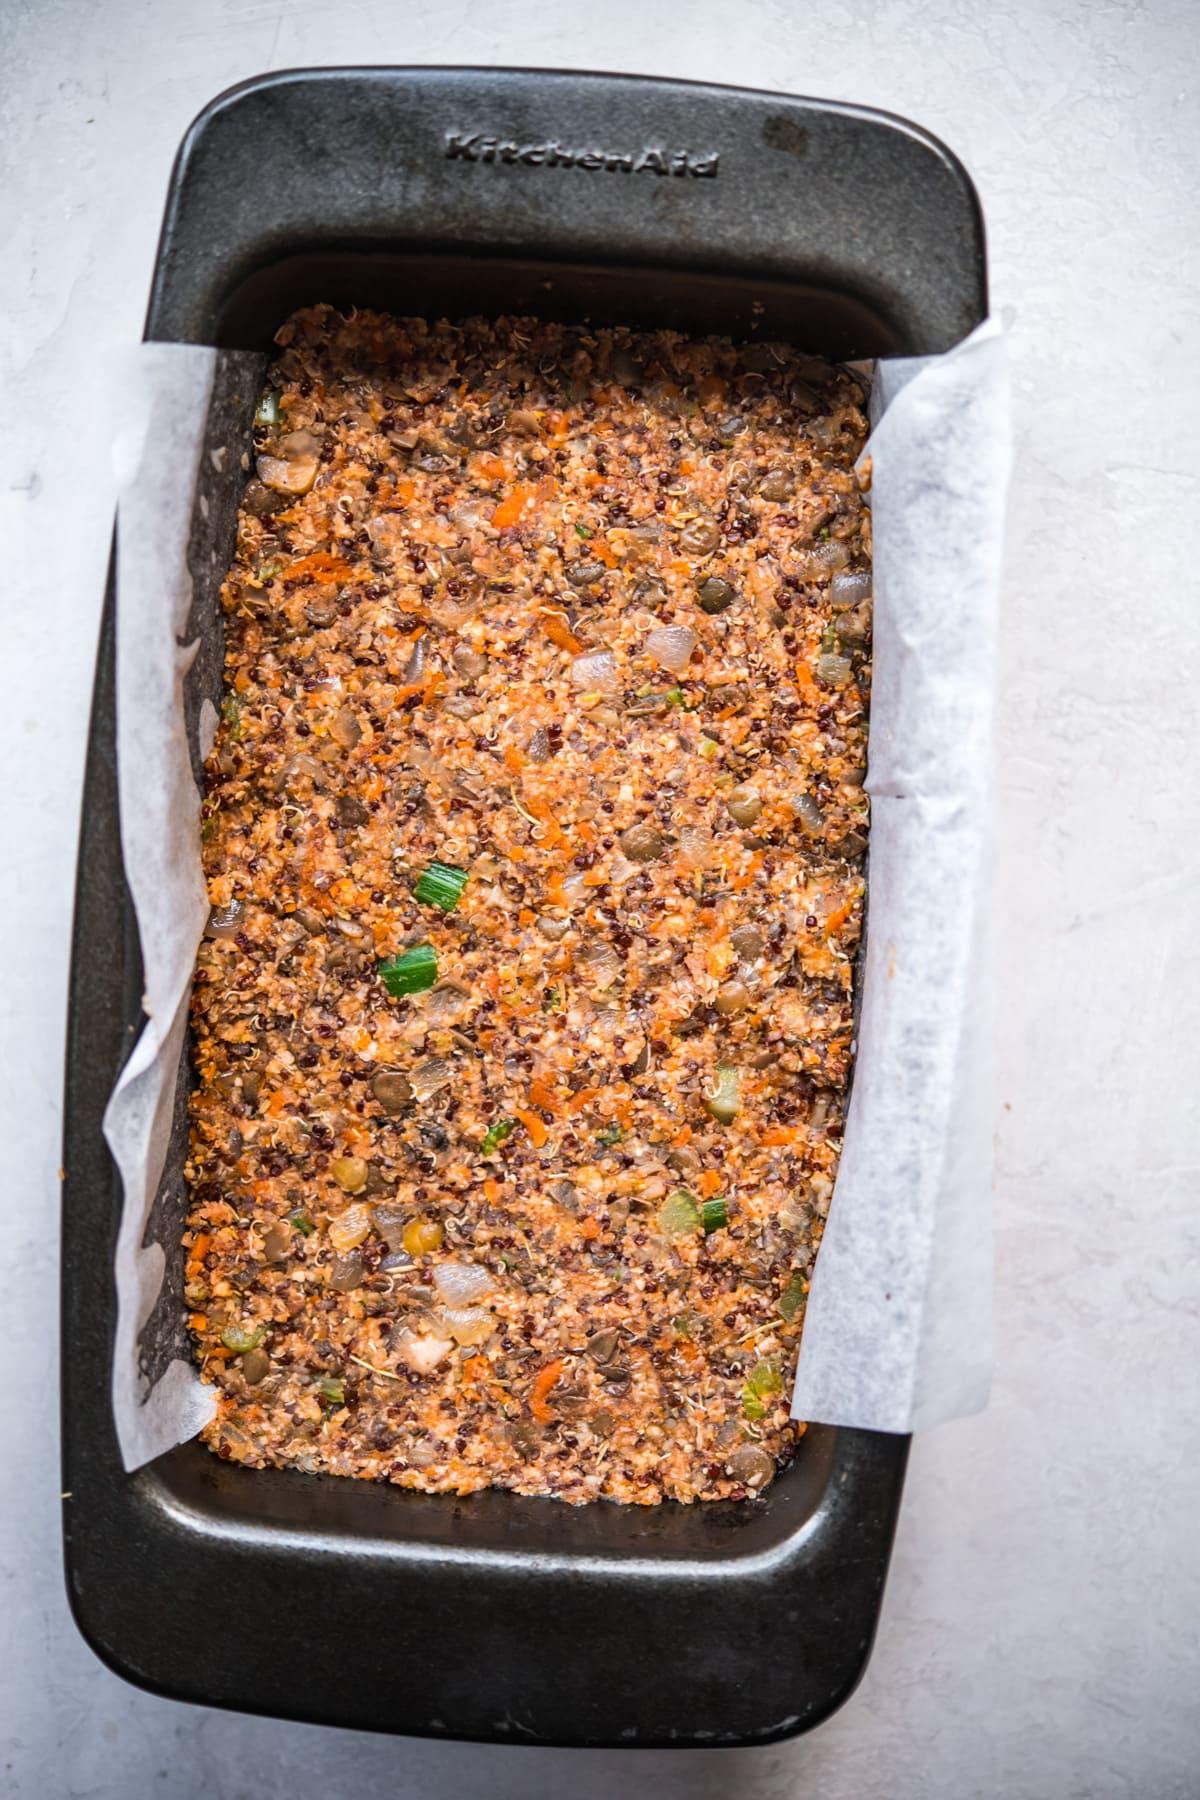 Vegan meatloaf pressed into a loaf pan before baking.